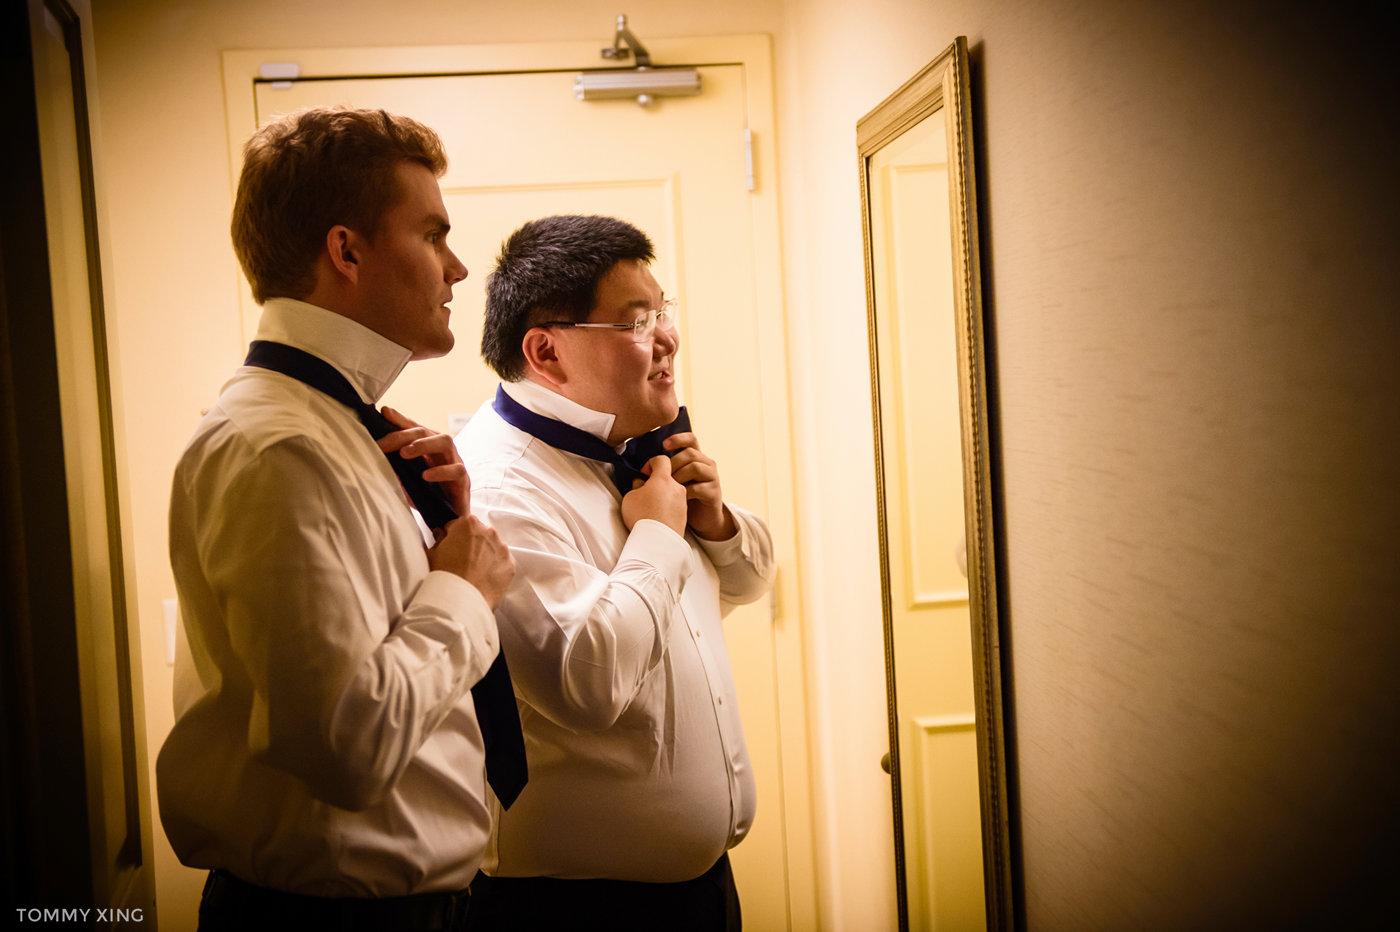 STANFORD MEMORIAL CHURCH WEDDING - Wenjie & Chengcheng - SAN FRANCISCO BAY AREA 斯坦福教堂婚礼跟拍 - 洛杉矶婚礼婚纱照摄影师 Tommy Xing Photography028.jpg